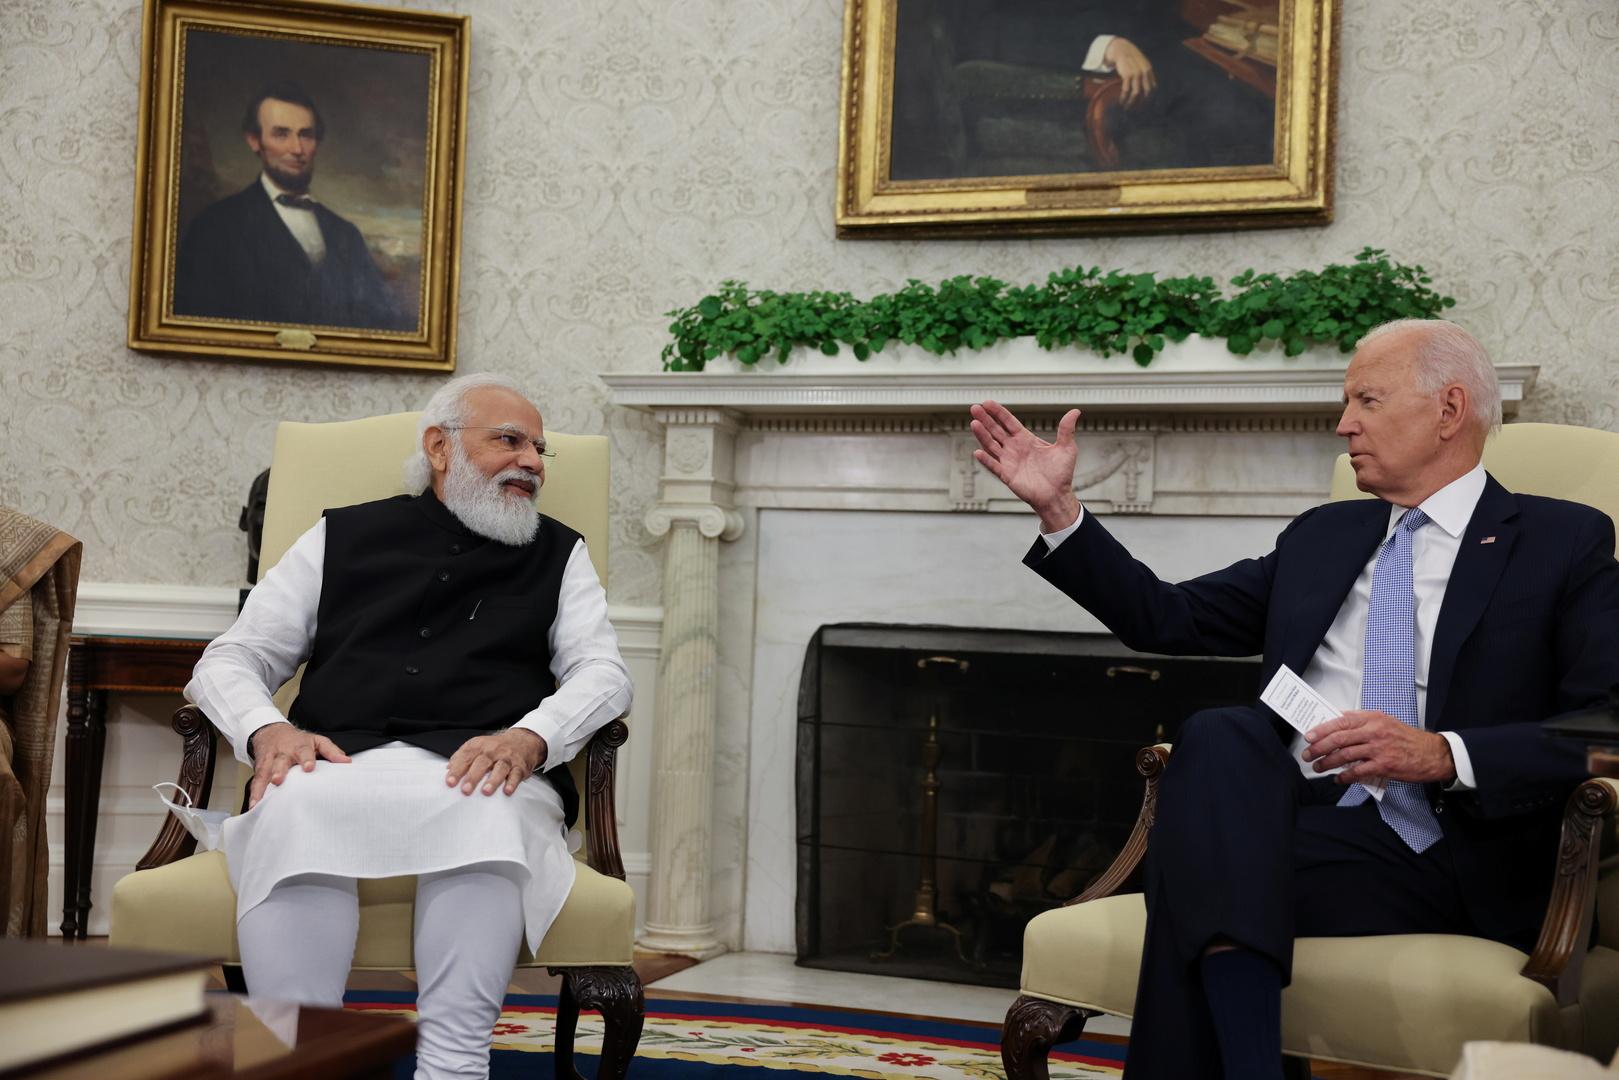 الرئيس الأمريكي جو بايدن يلتقي رئيس الوزراء الهندي ناريندرا مودي